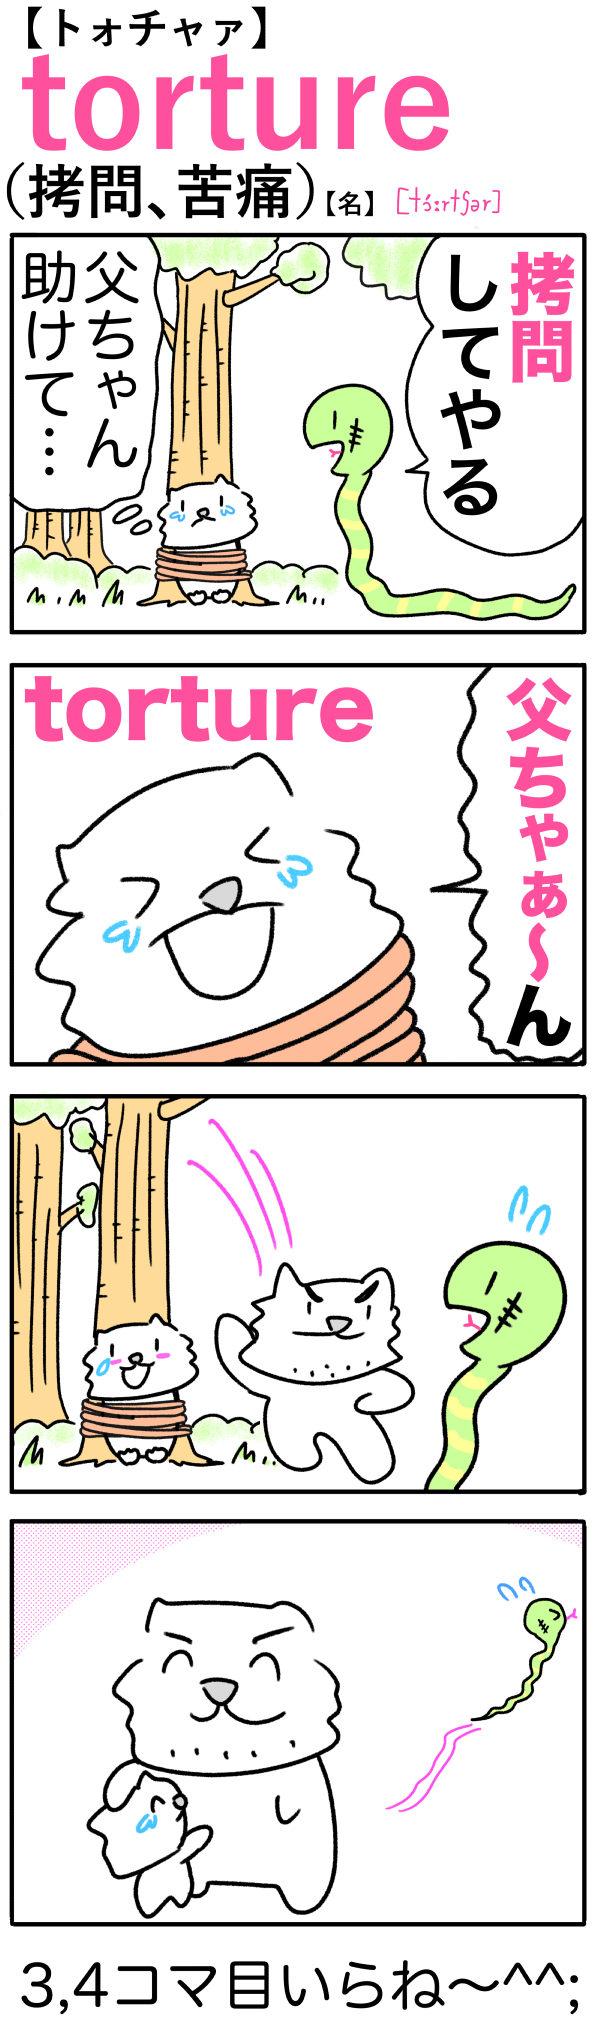 torture(拷問)の語呂合わせ英単語